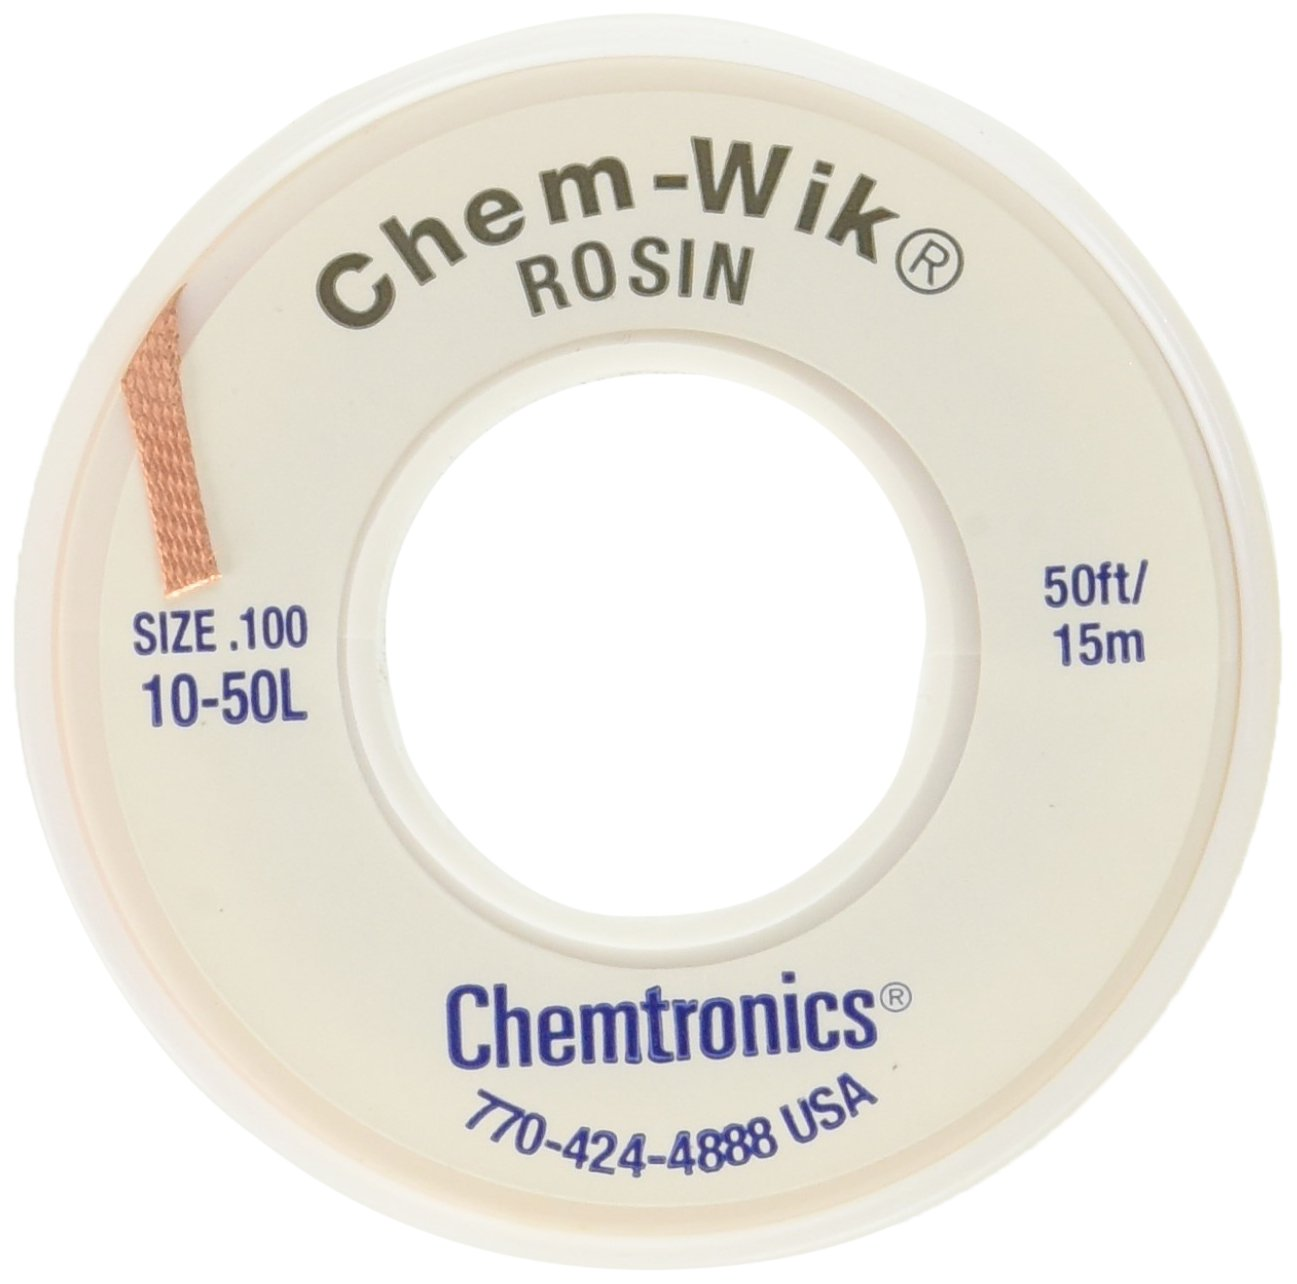 Chemtronics Desoldering Braid Chem Wik Rosin 10 50L 0.10 50ft.